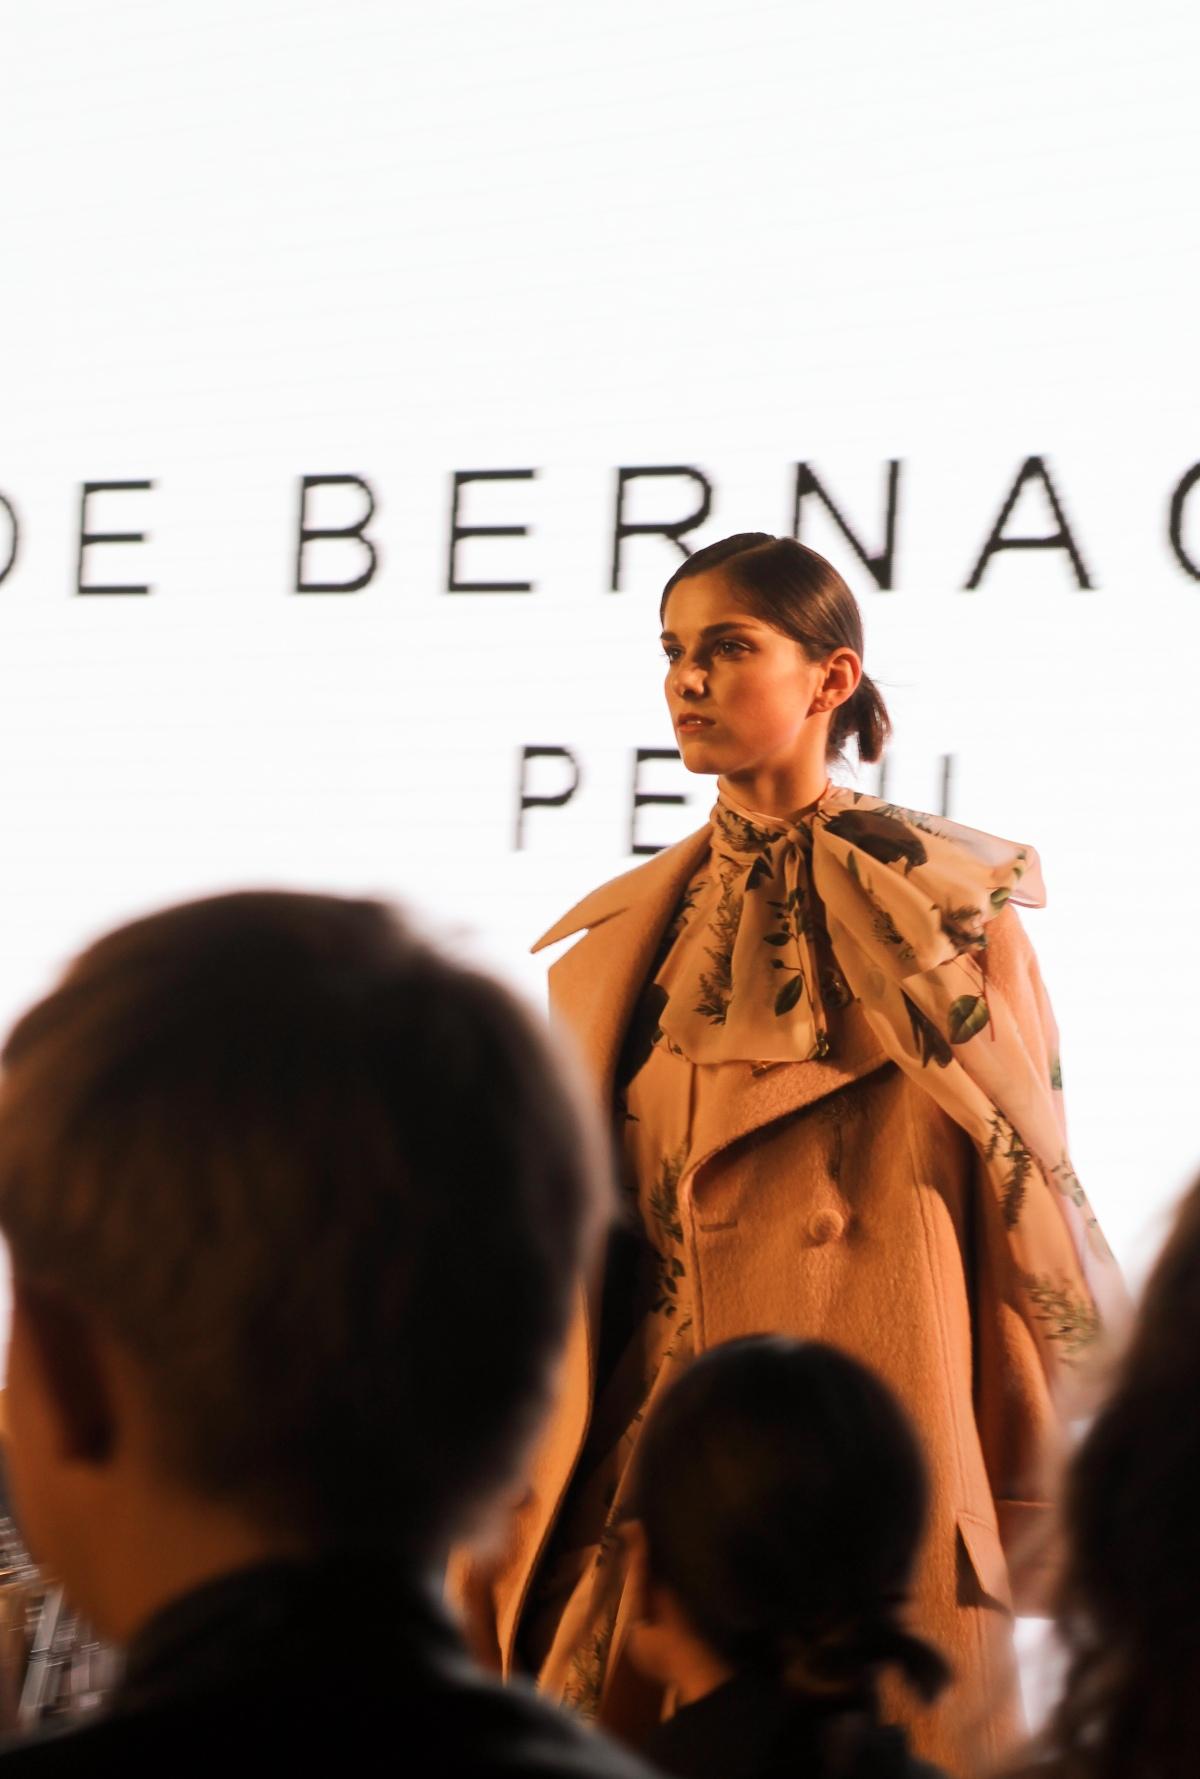 LA Fashion Week, Noe Bernacelli, fashion week, fashion month, SS20, haute couture, Peruvian fashion designer, fashion designer, alpaca fur coat, chiffon, beading, couture gowns, fashion blogger, LA fashion blogger, Petersen Automotive Museum